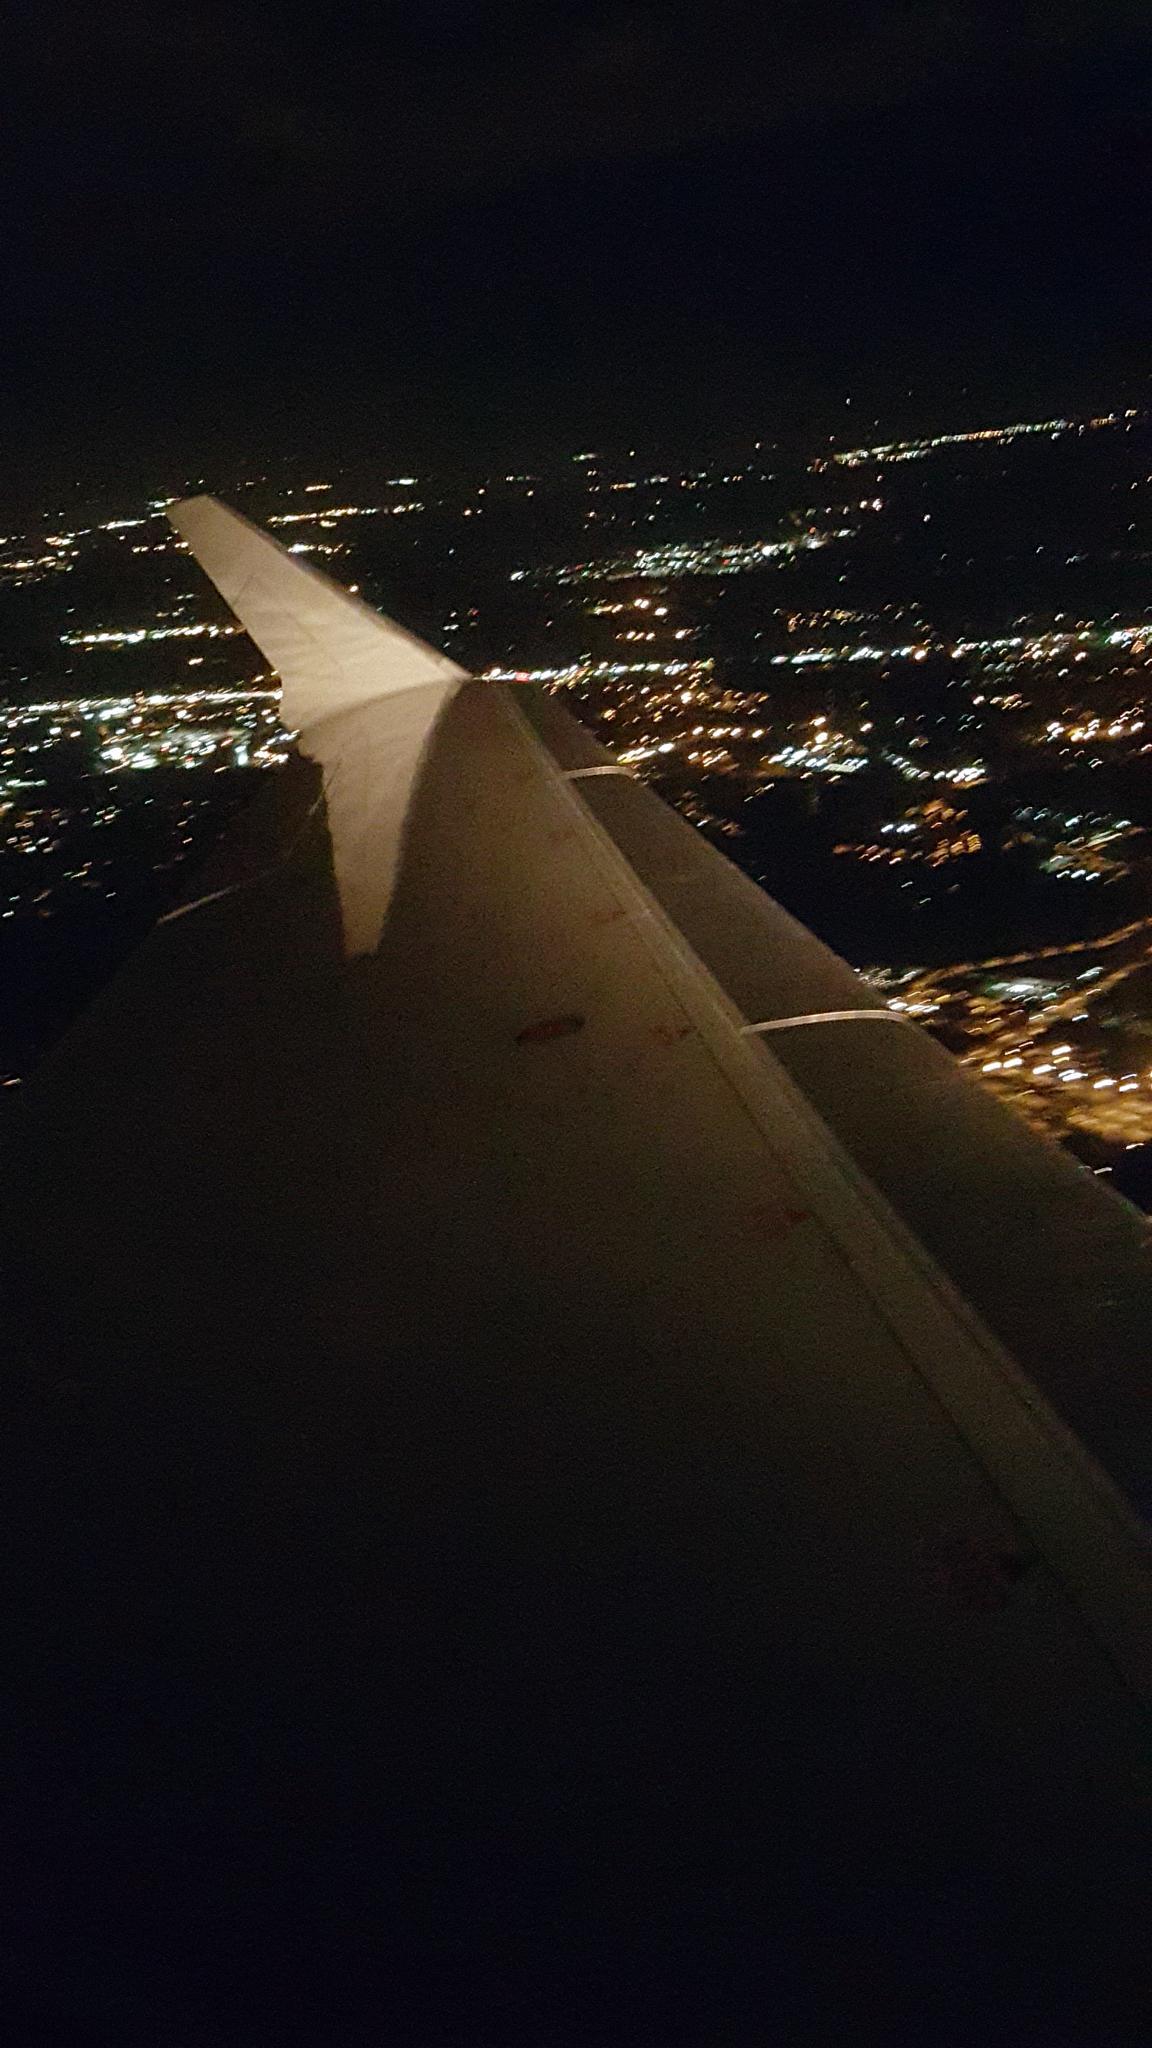 Leaving on a jet plane by Antonette Stiebritz